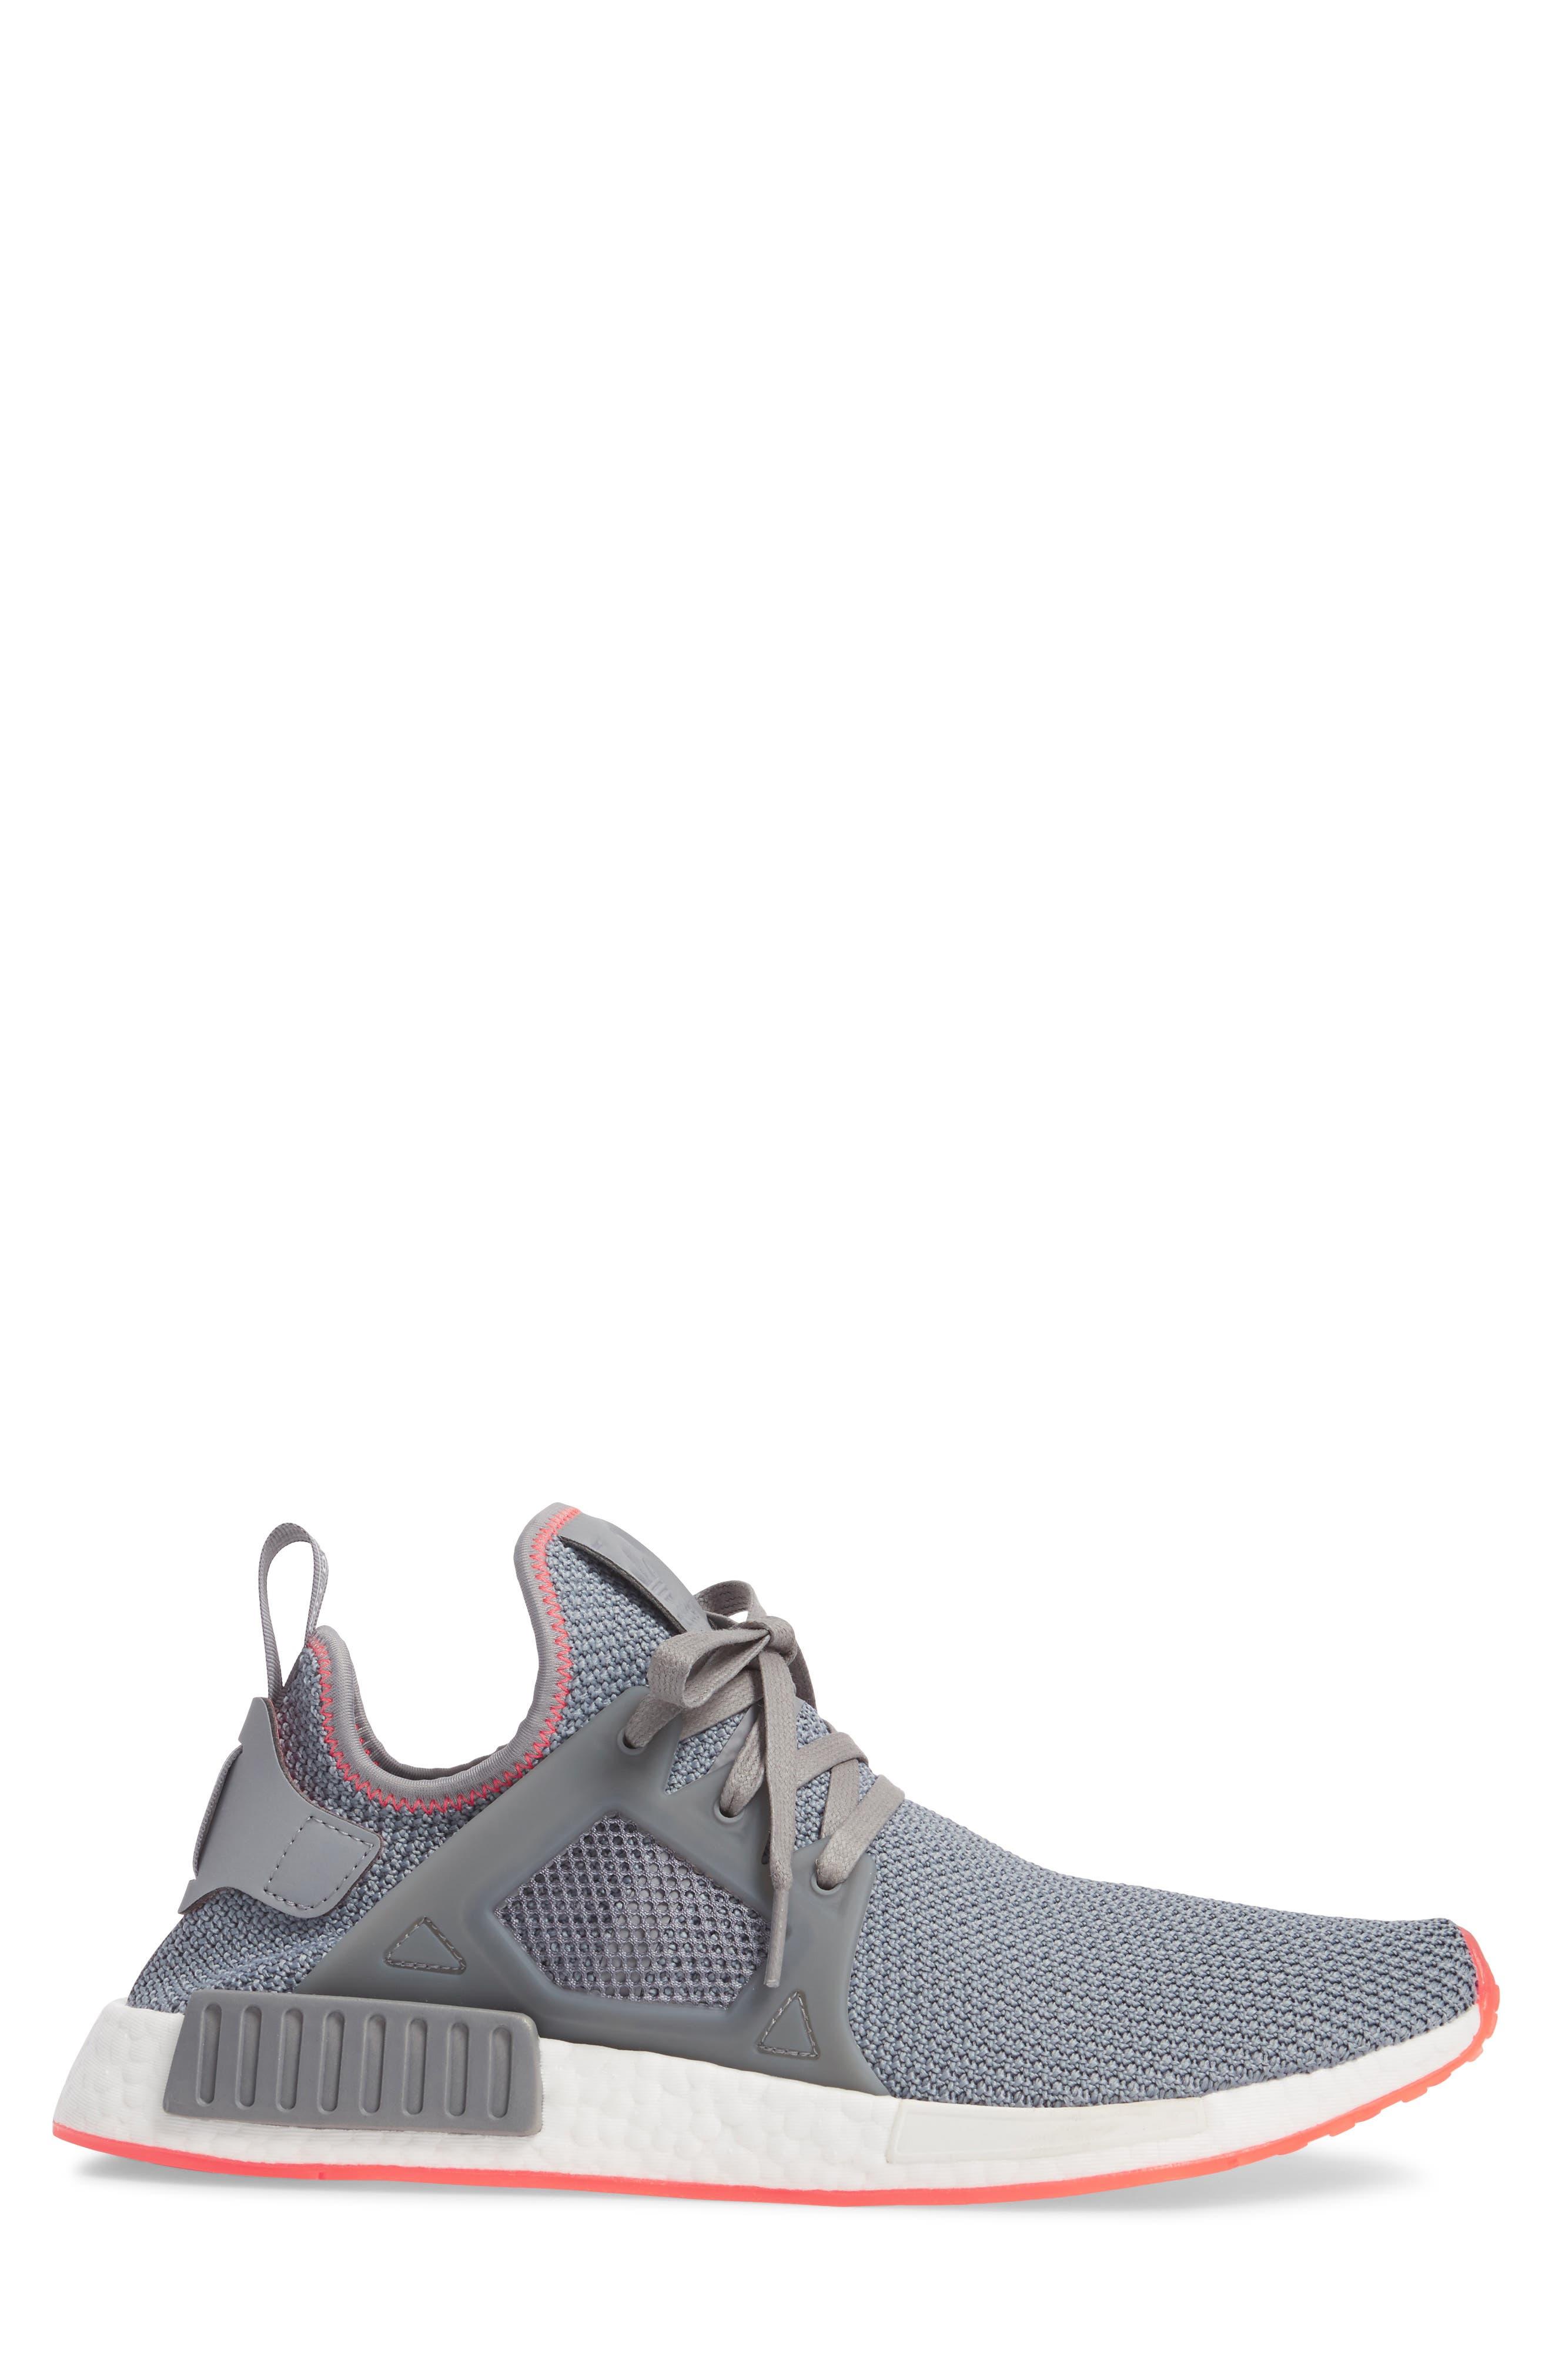 NMD_XR1 Sneaker,                             Alternate thumbnail 6, color,